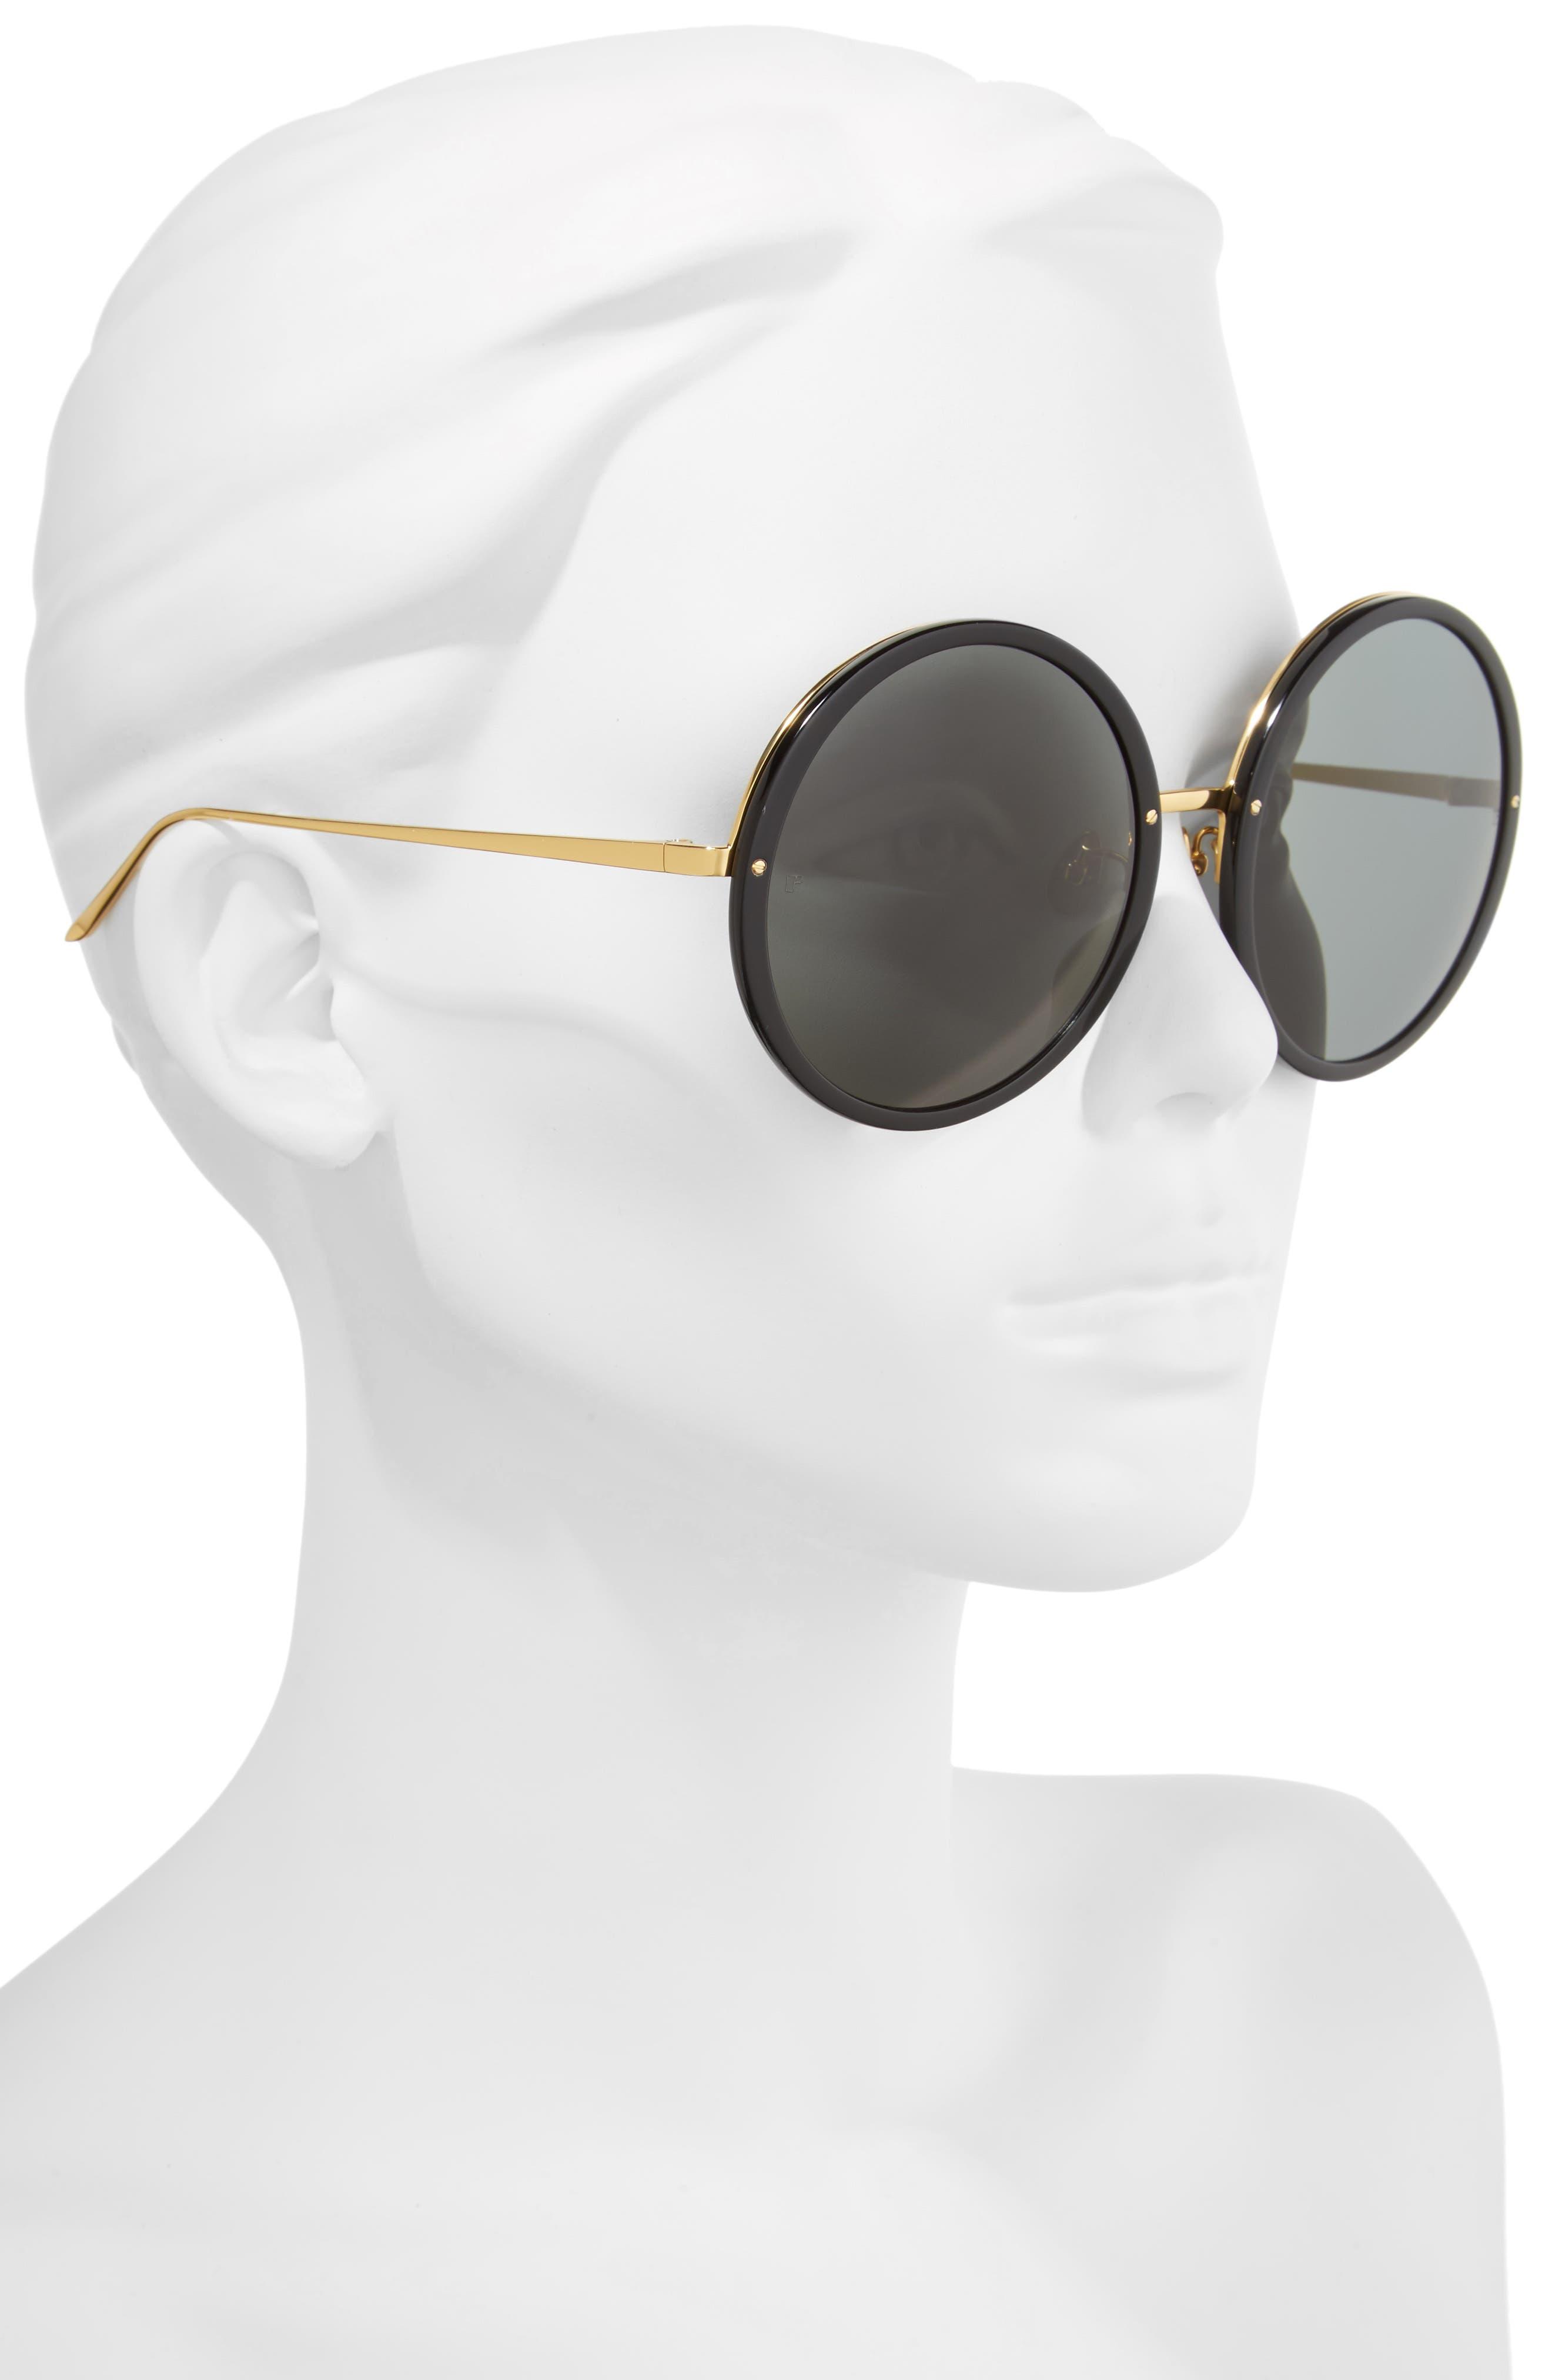 61mm Round 18 Karat Gold Trim Sunglasses,                             Alternate thumbnail 2, color,                             BLACK/ YELLOW GOLD/ GREY